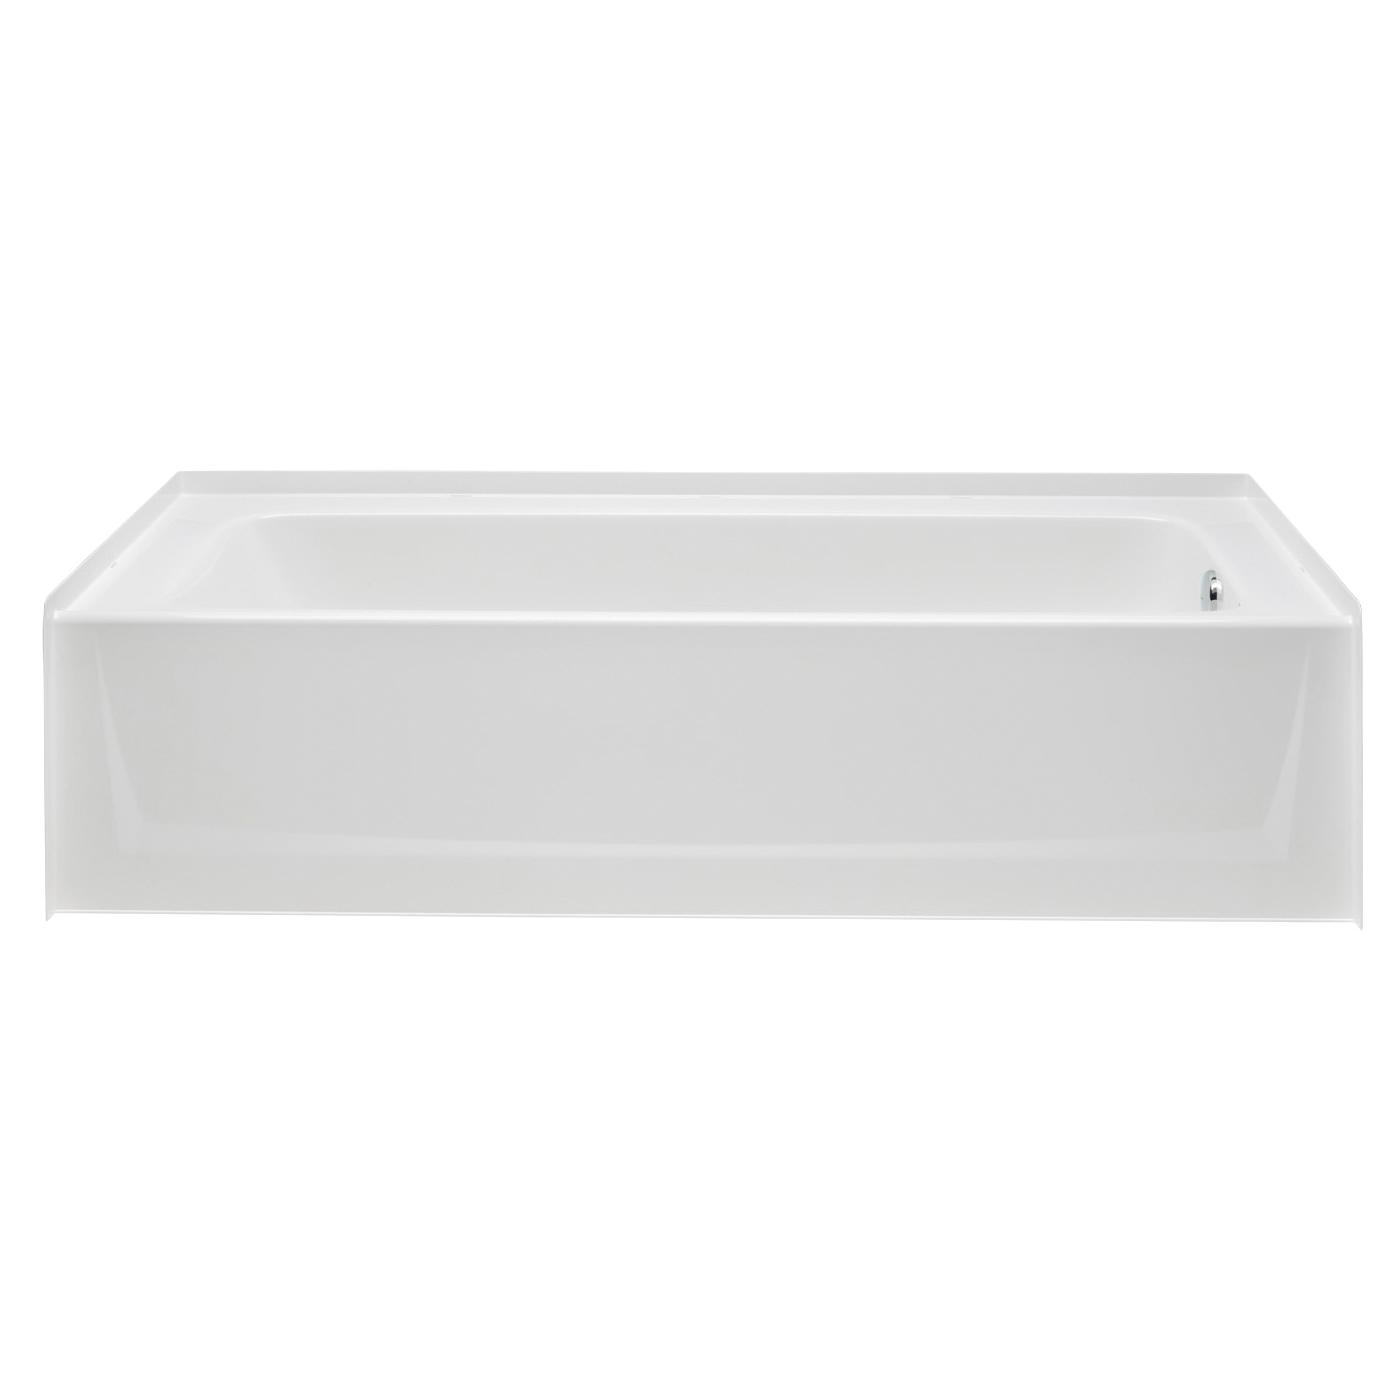 Aquatic 6030CT-LH-WHT Bathtub, Soaking, 60 in W, Left Hand Drain, White